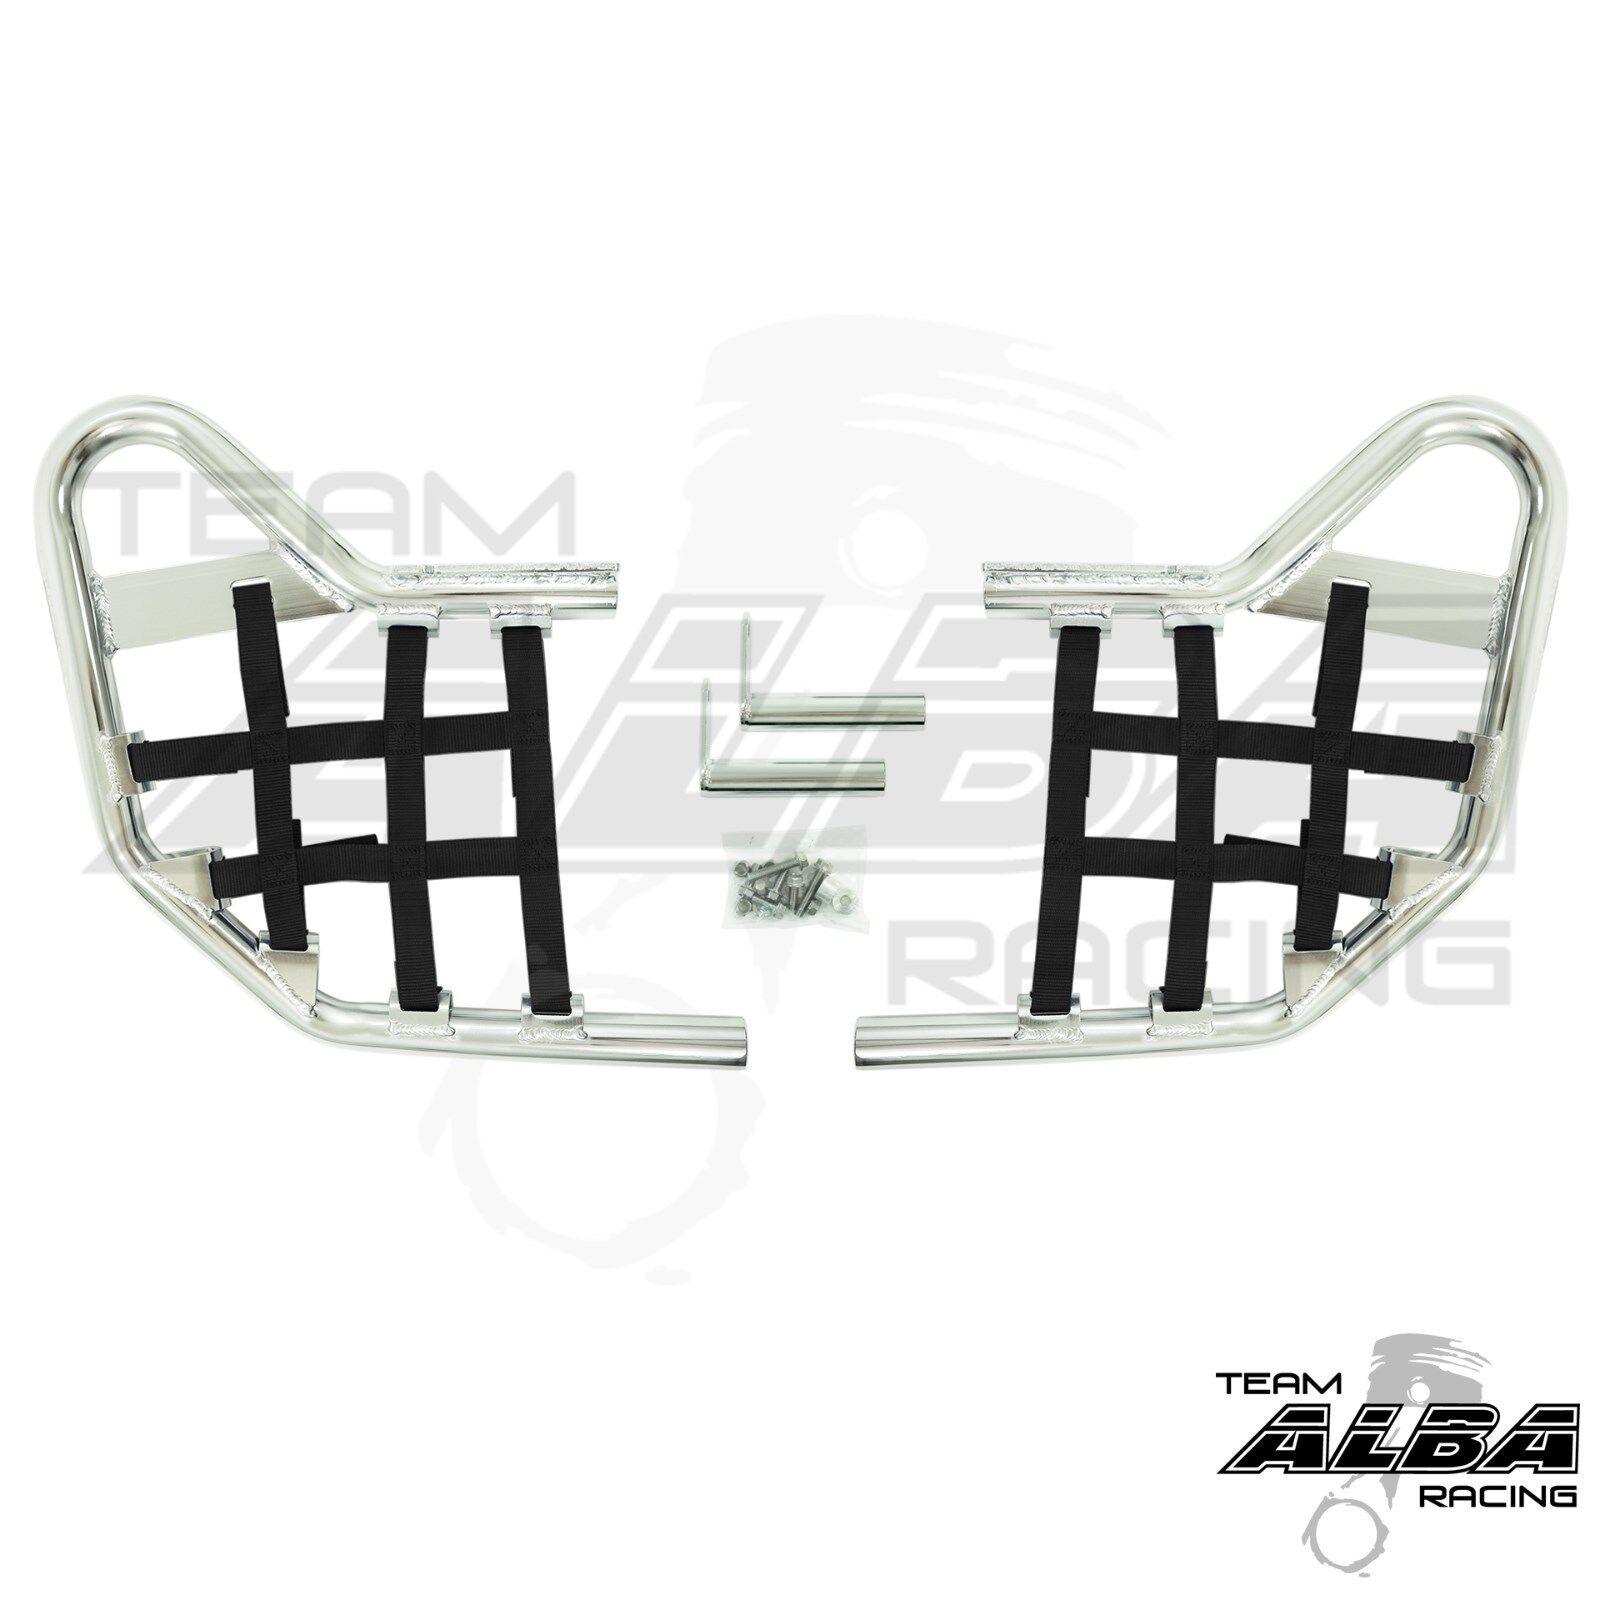 Warrior YFM 350 YFM350  Nerf Bars  Alba Racing  Silver bar Black nets  210 T1 SB